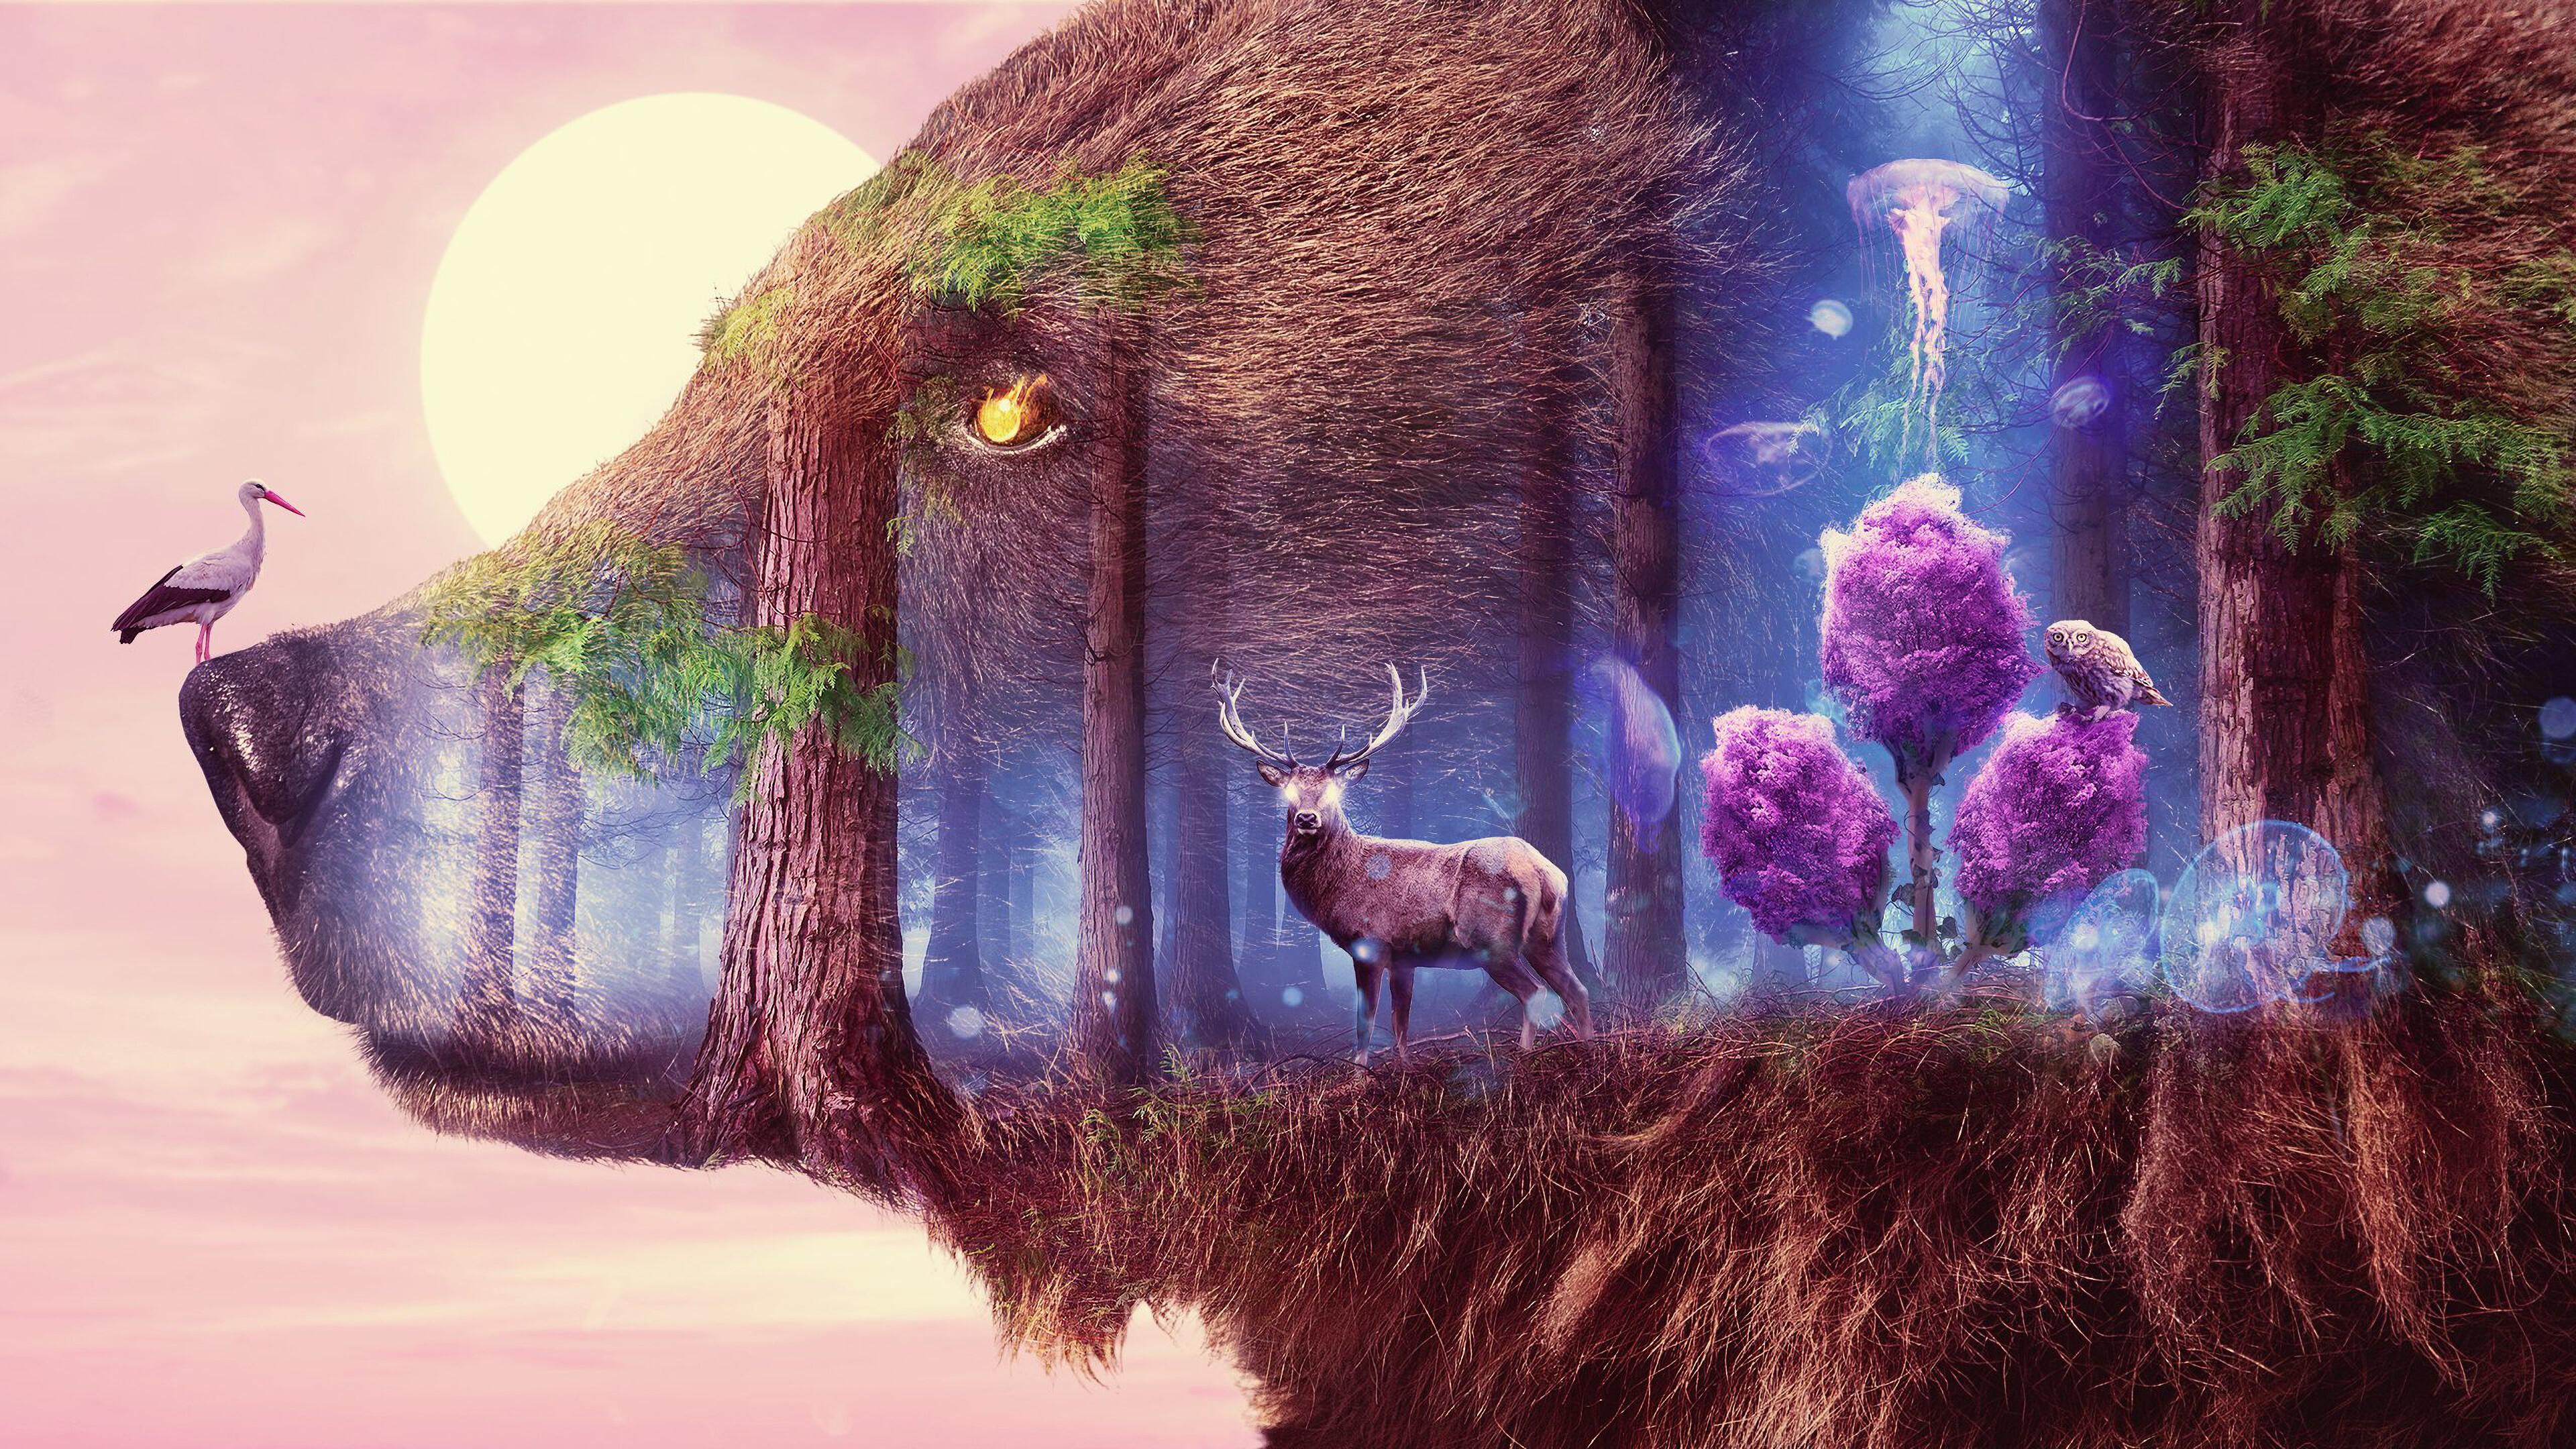 General 3840x2160 digital digital art artwork illustration nature trees forest fantasy art animals deer wolf lights landscape owl jellyfish